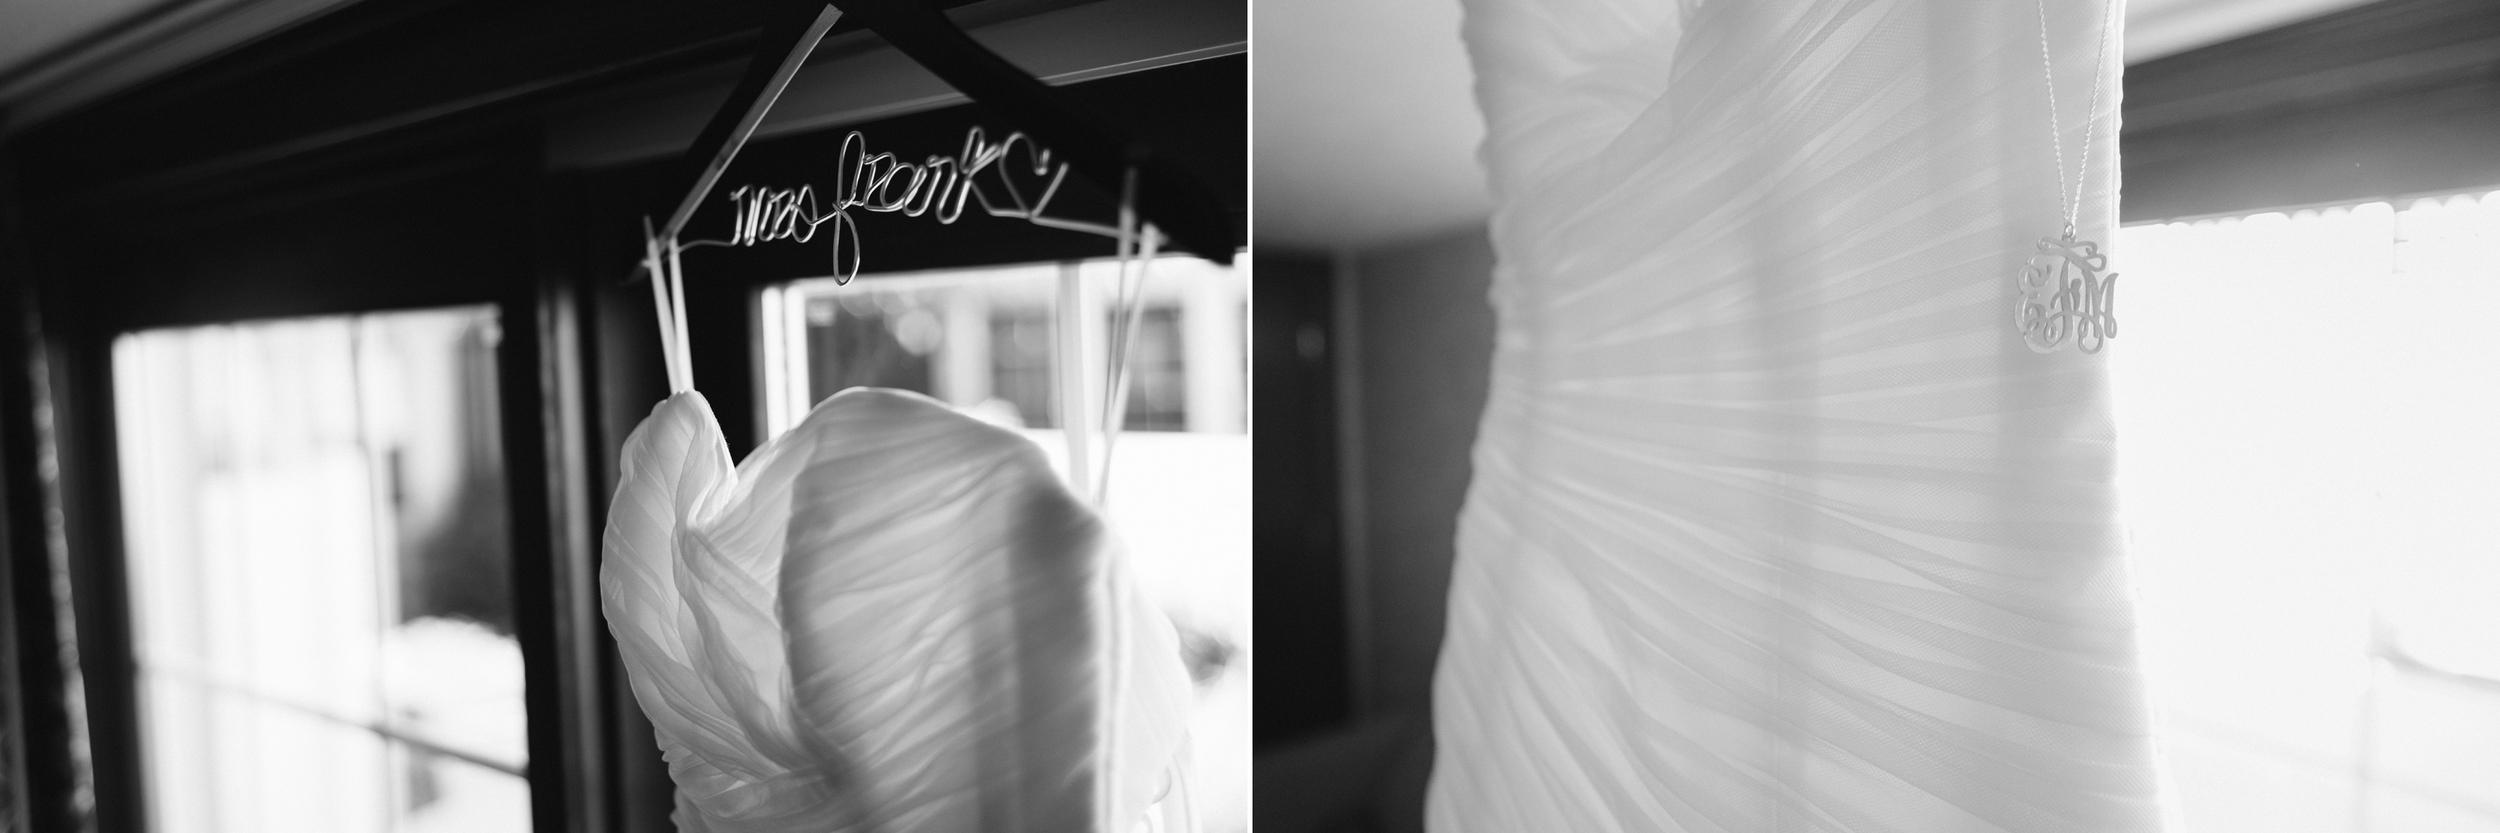 Matt_Swetel_Photography_Erin_and_Jeff_married004.jpg